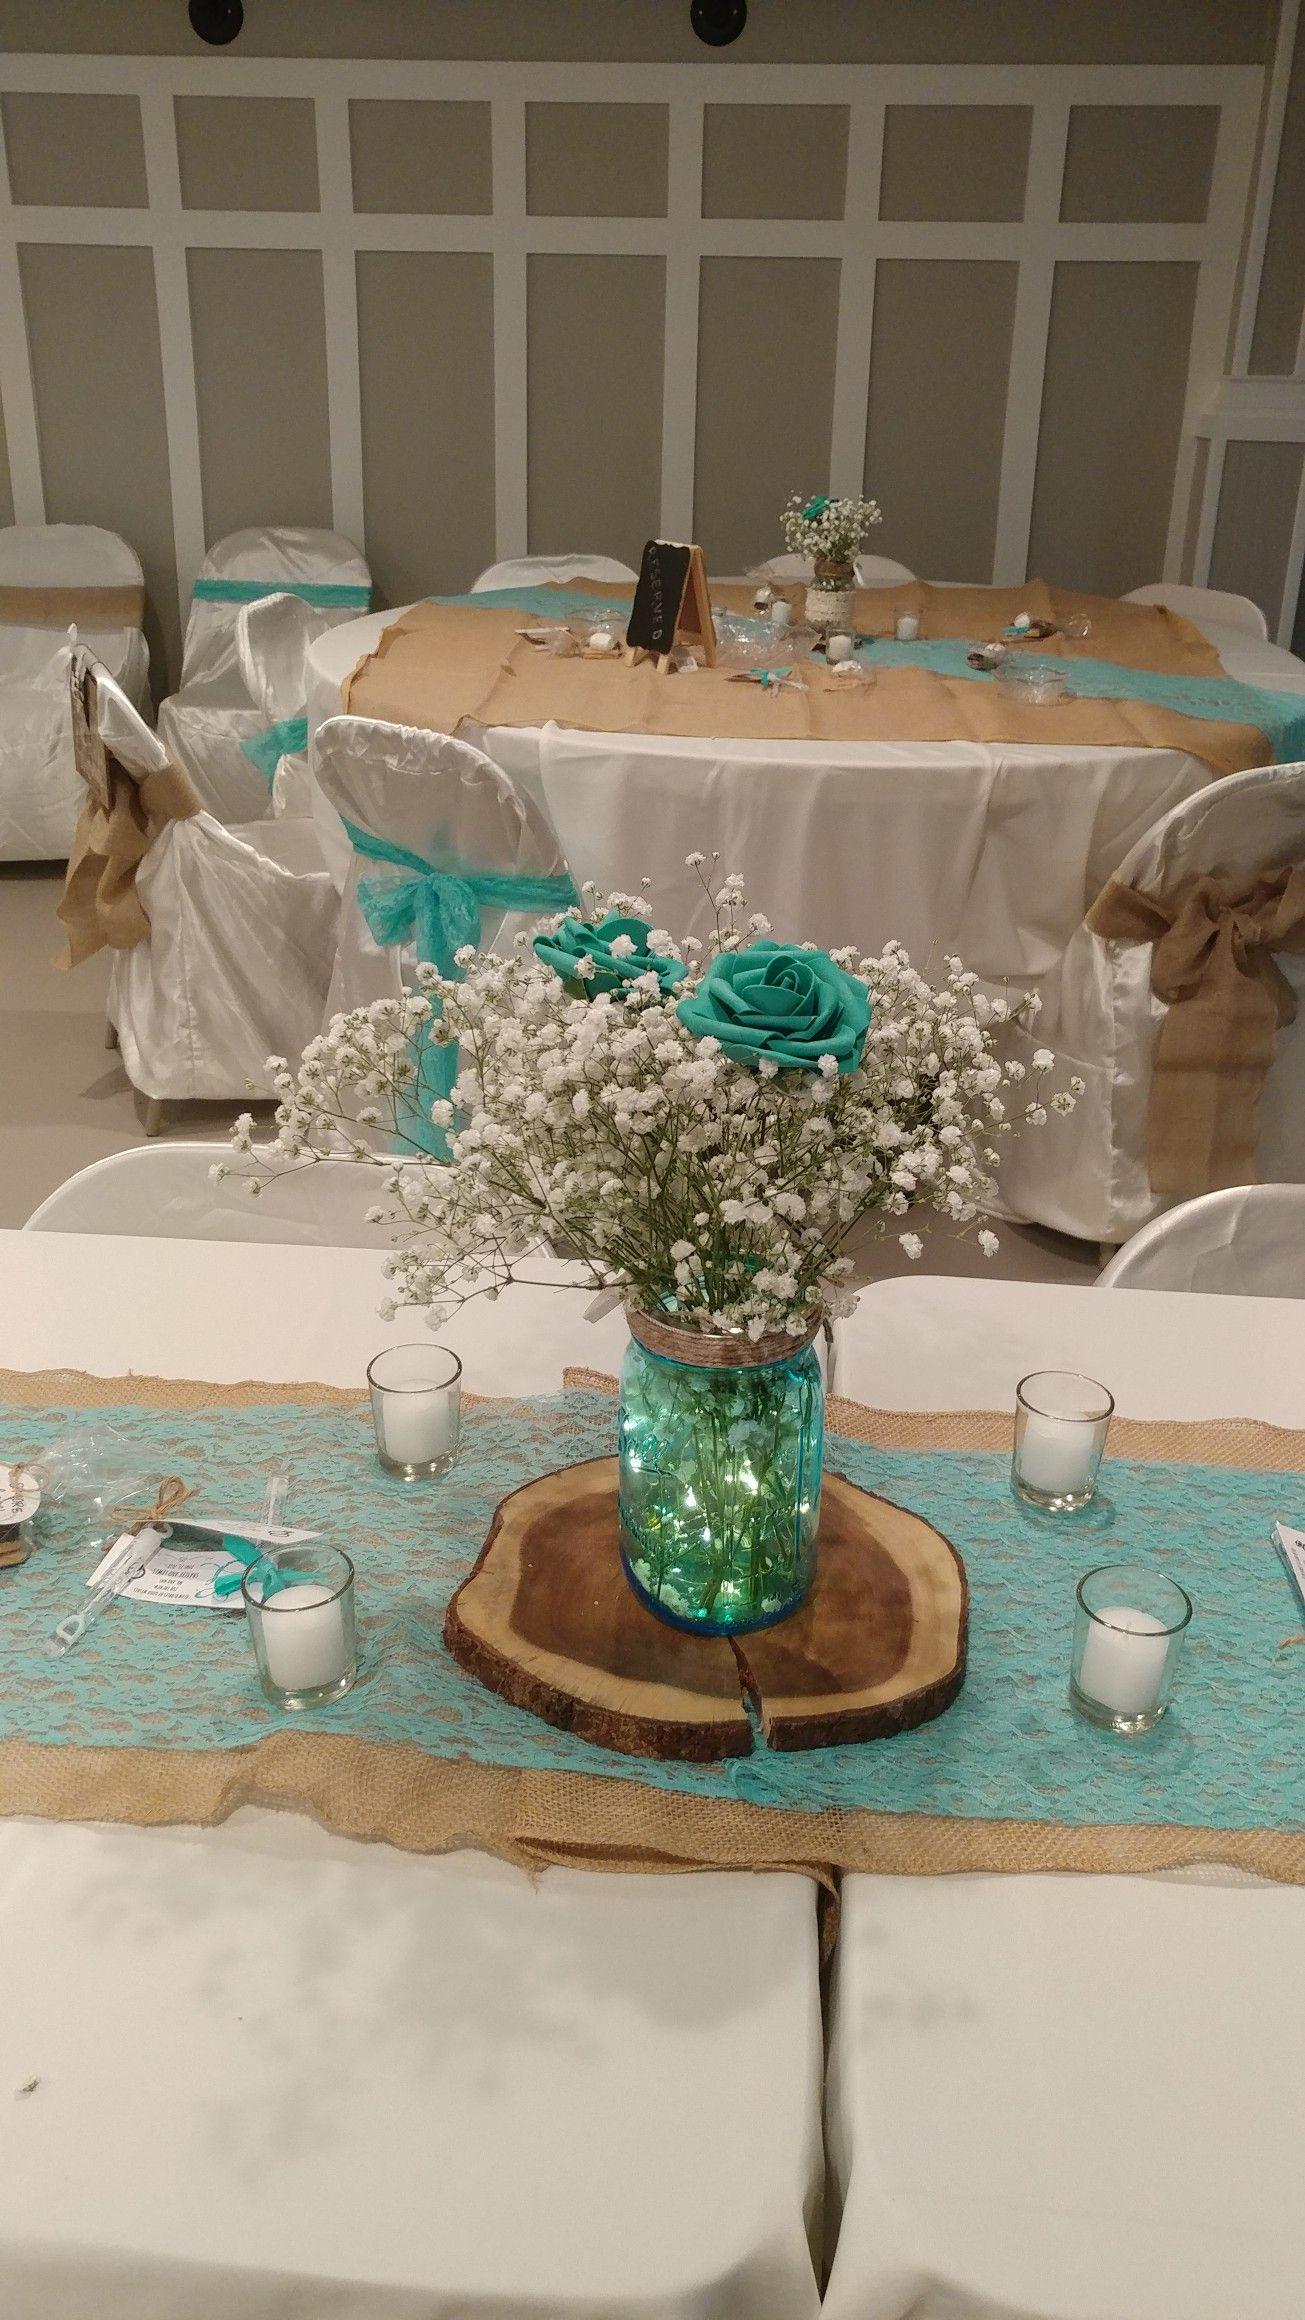 Teal Rustic Mason Jar Centerpiece Teal Wedding Decorations Teal Wedding Centerpieces Wedding Centerpieces Mason Jars